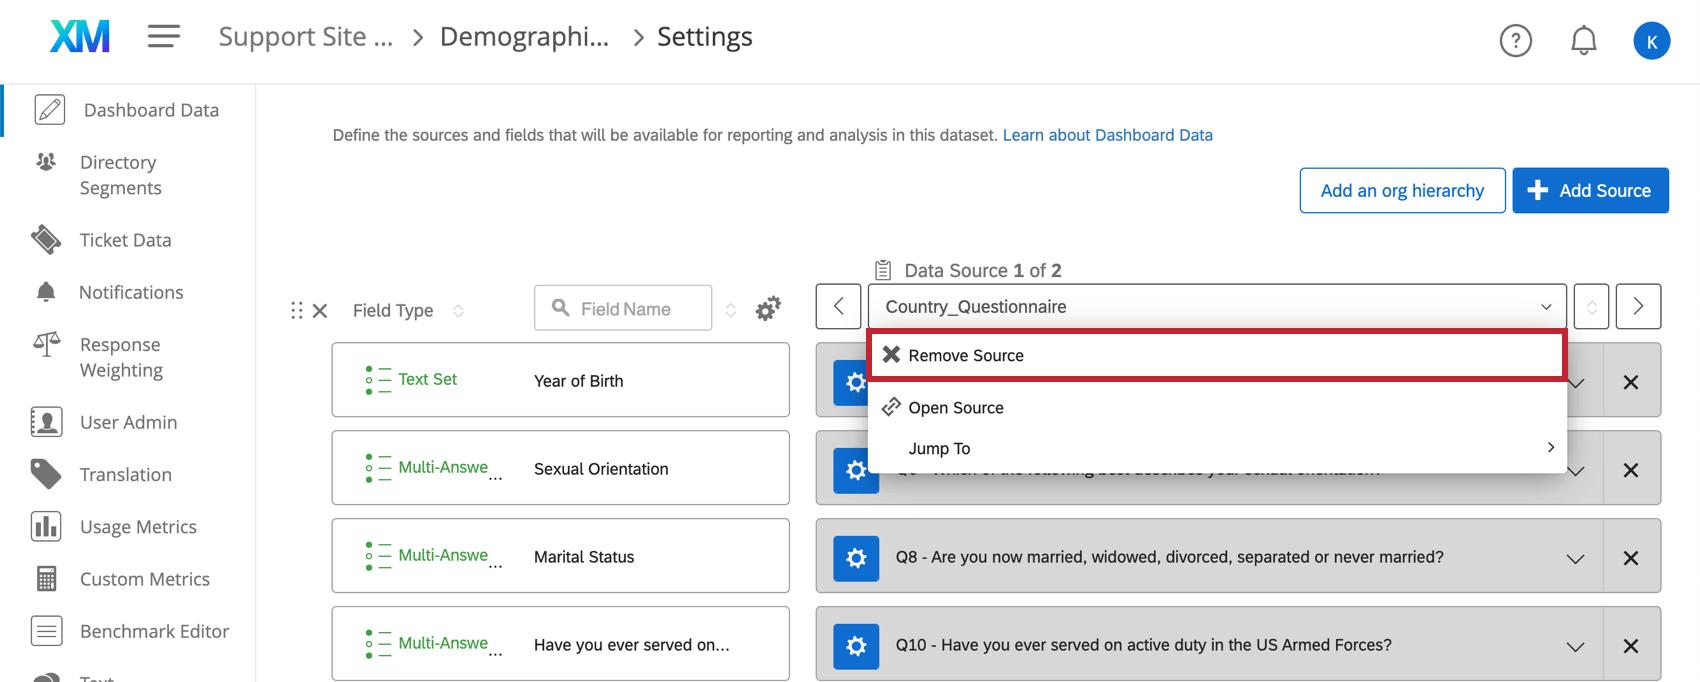 Dashboard Data project mapper page. Dropdown menu has a remove option